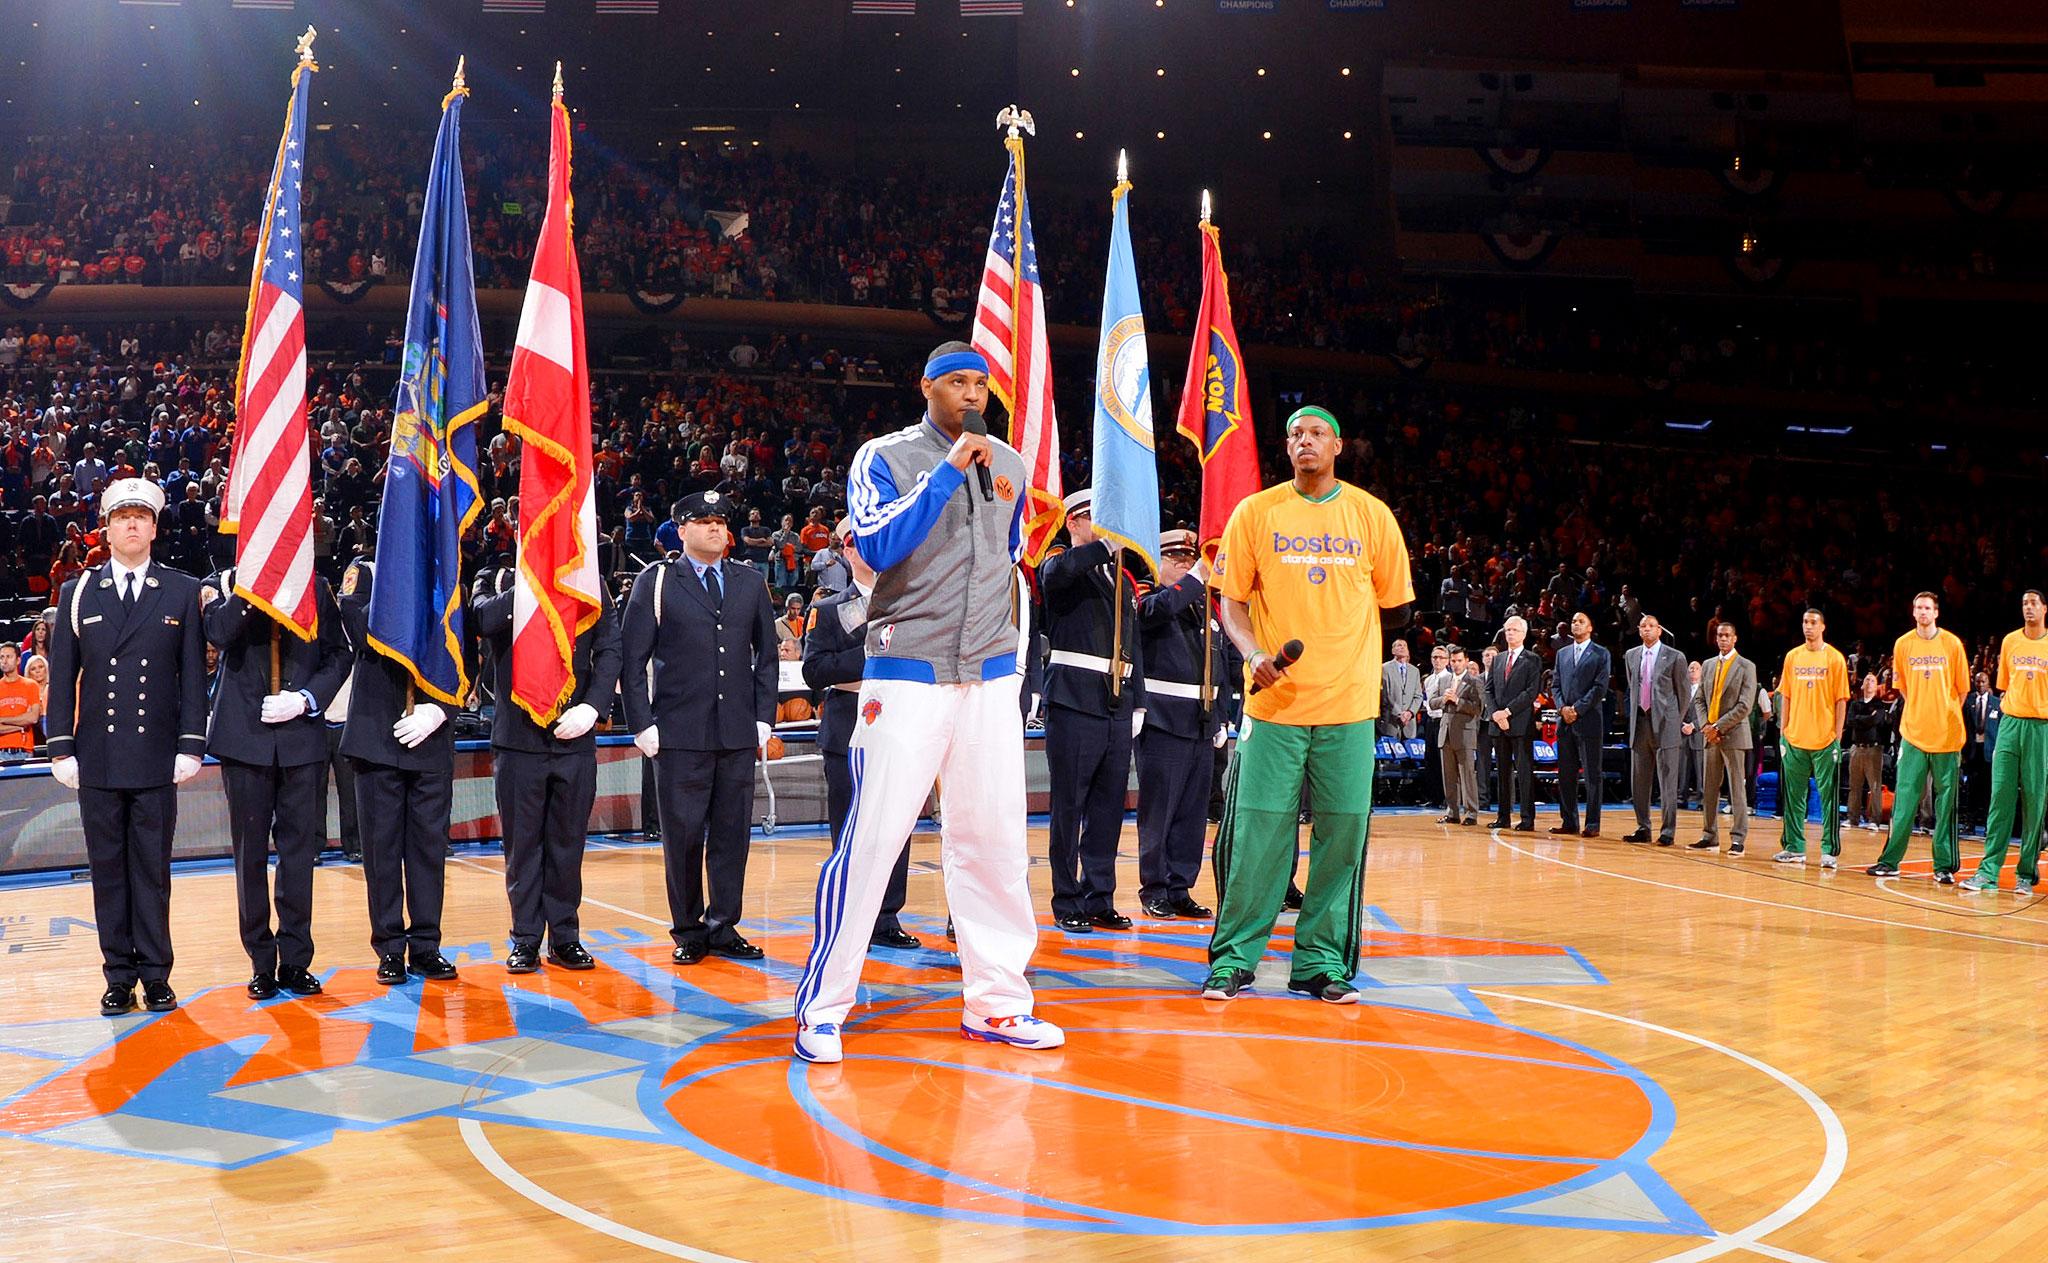 New York Honors Boston